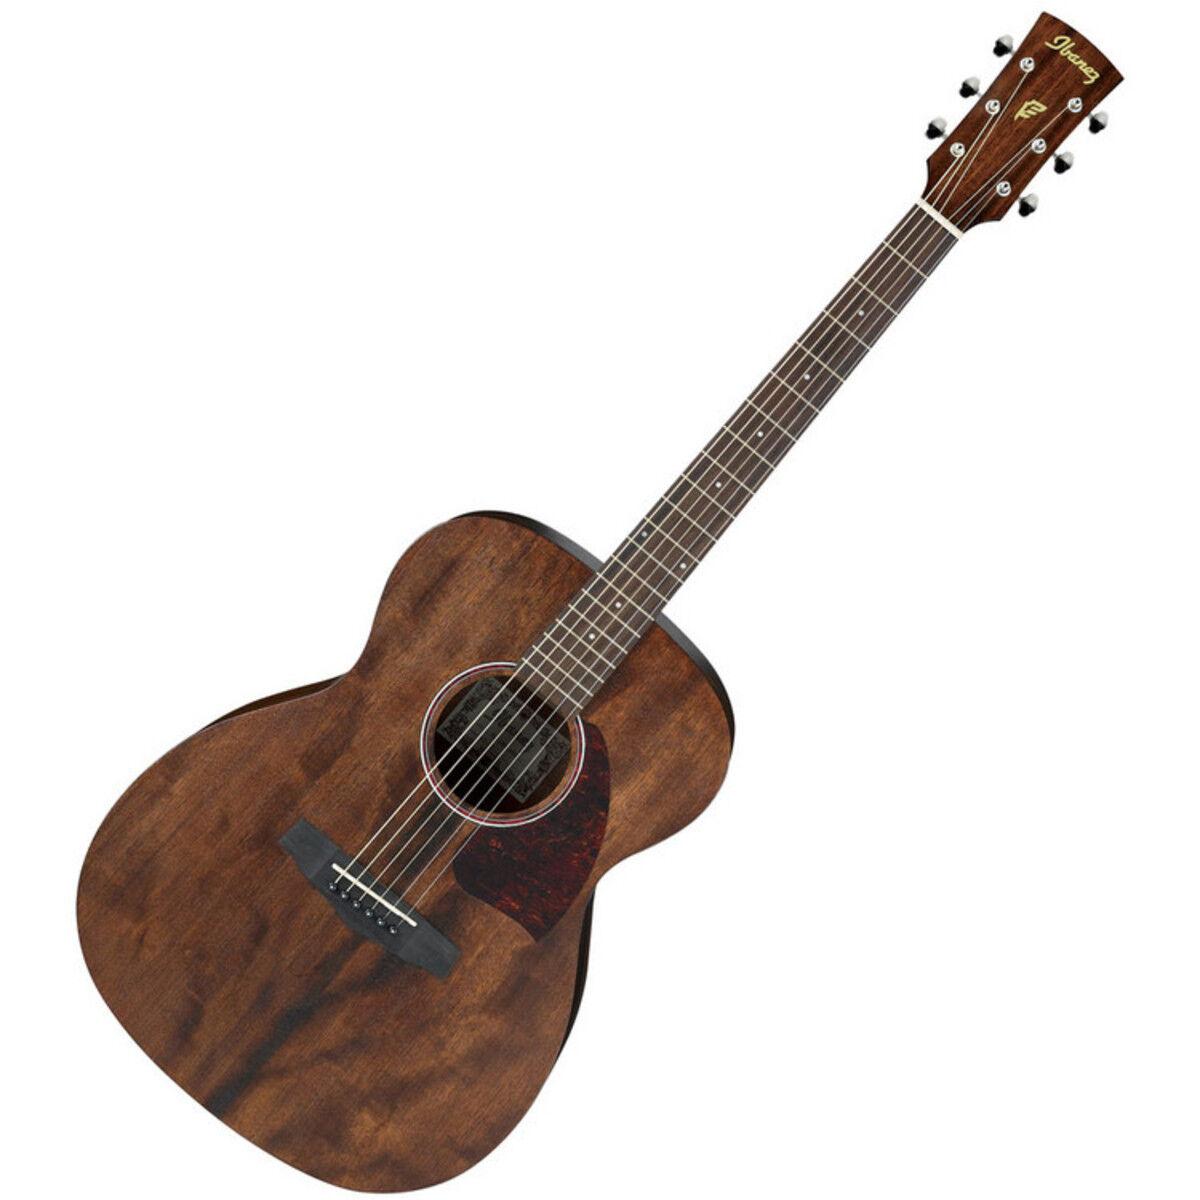 Ibanez PC12MH-OPN - Concert Acoustic Guitar, Open Pore Natural